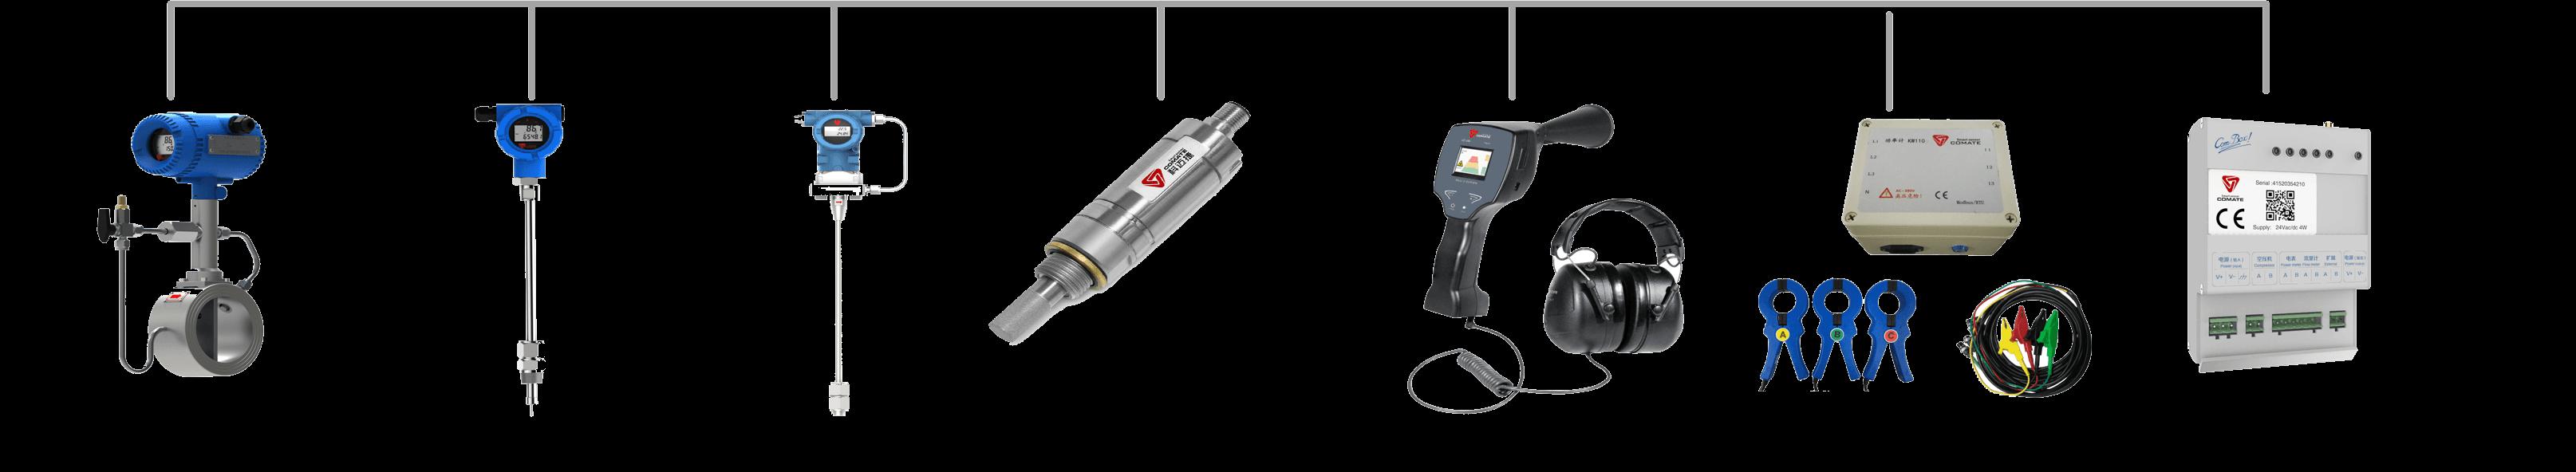 COMATE-INSTRUMENTS-compressor